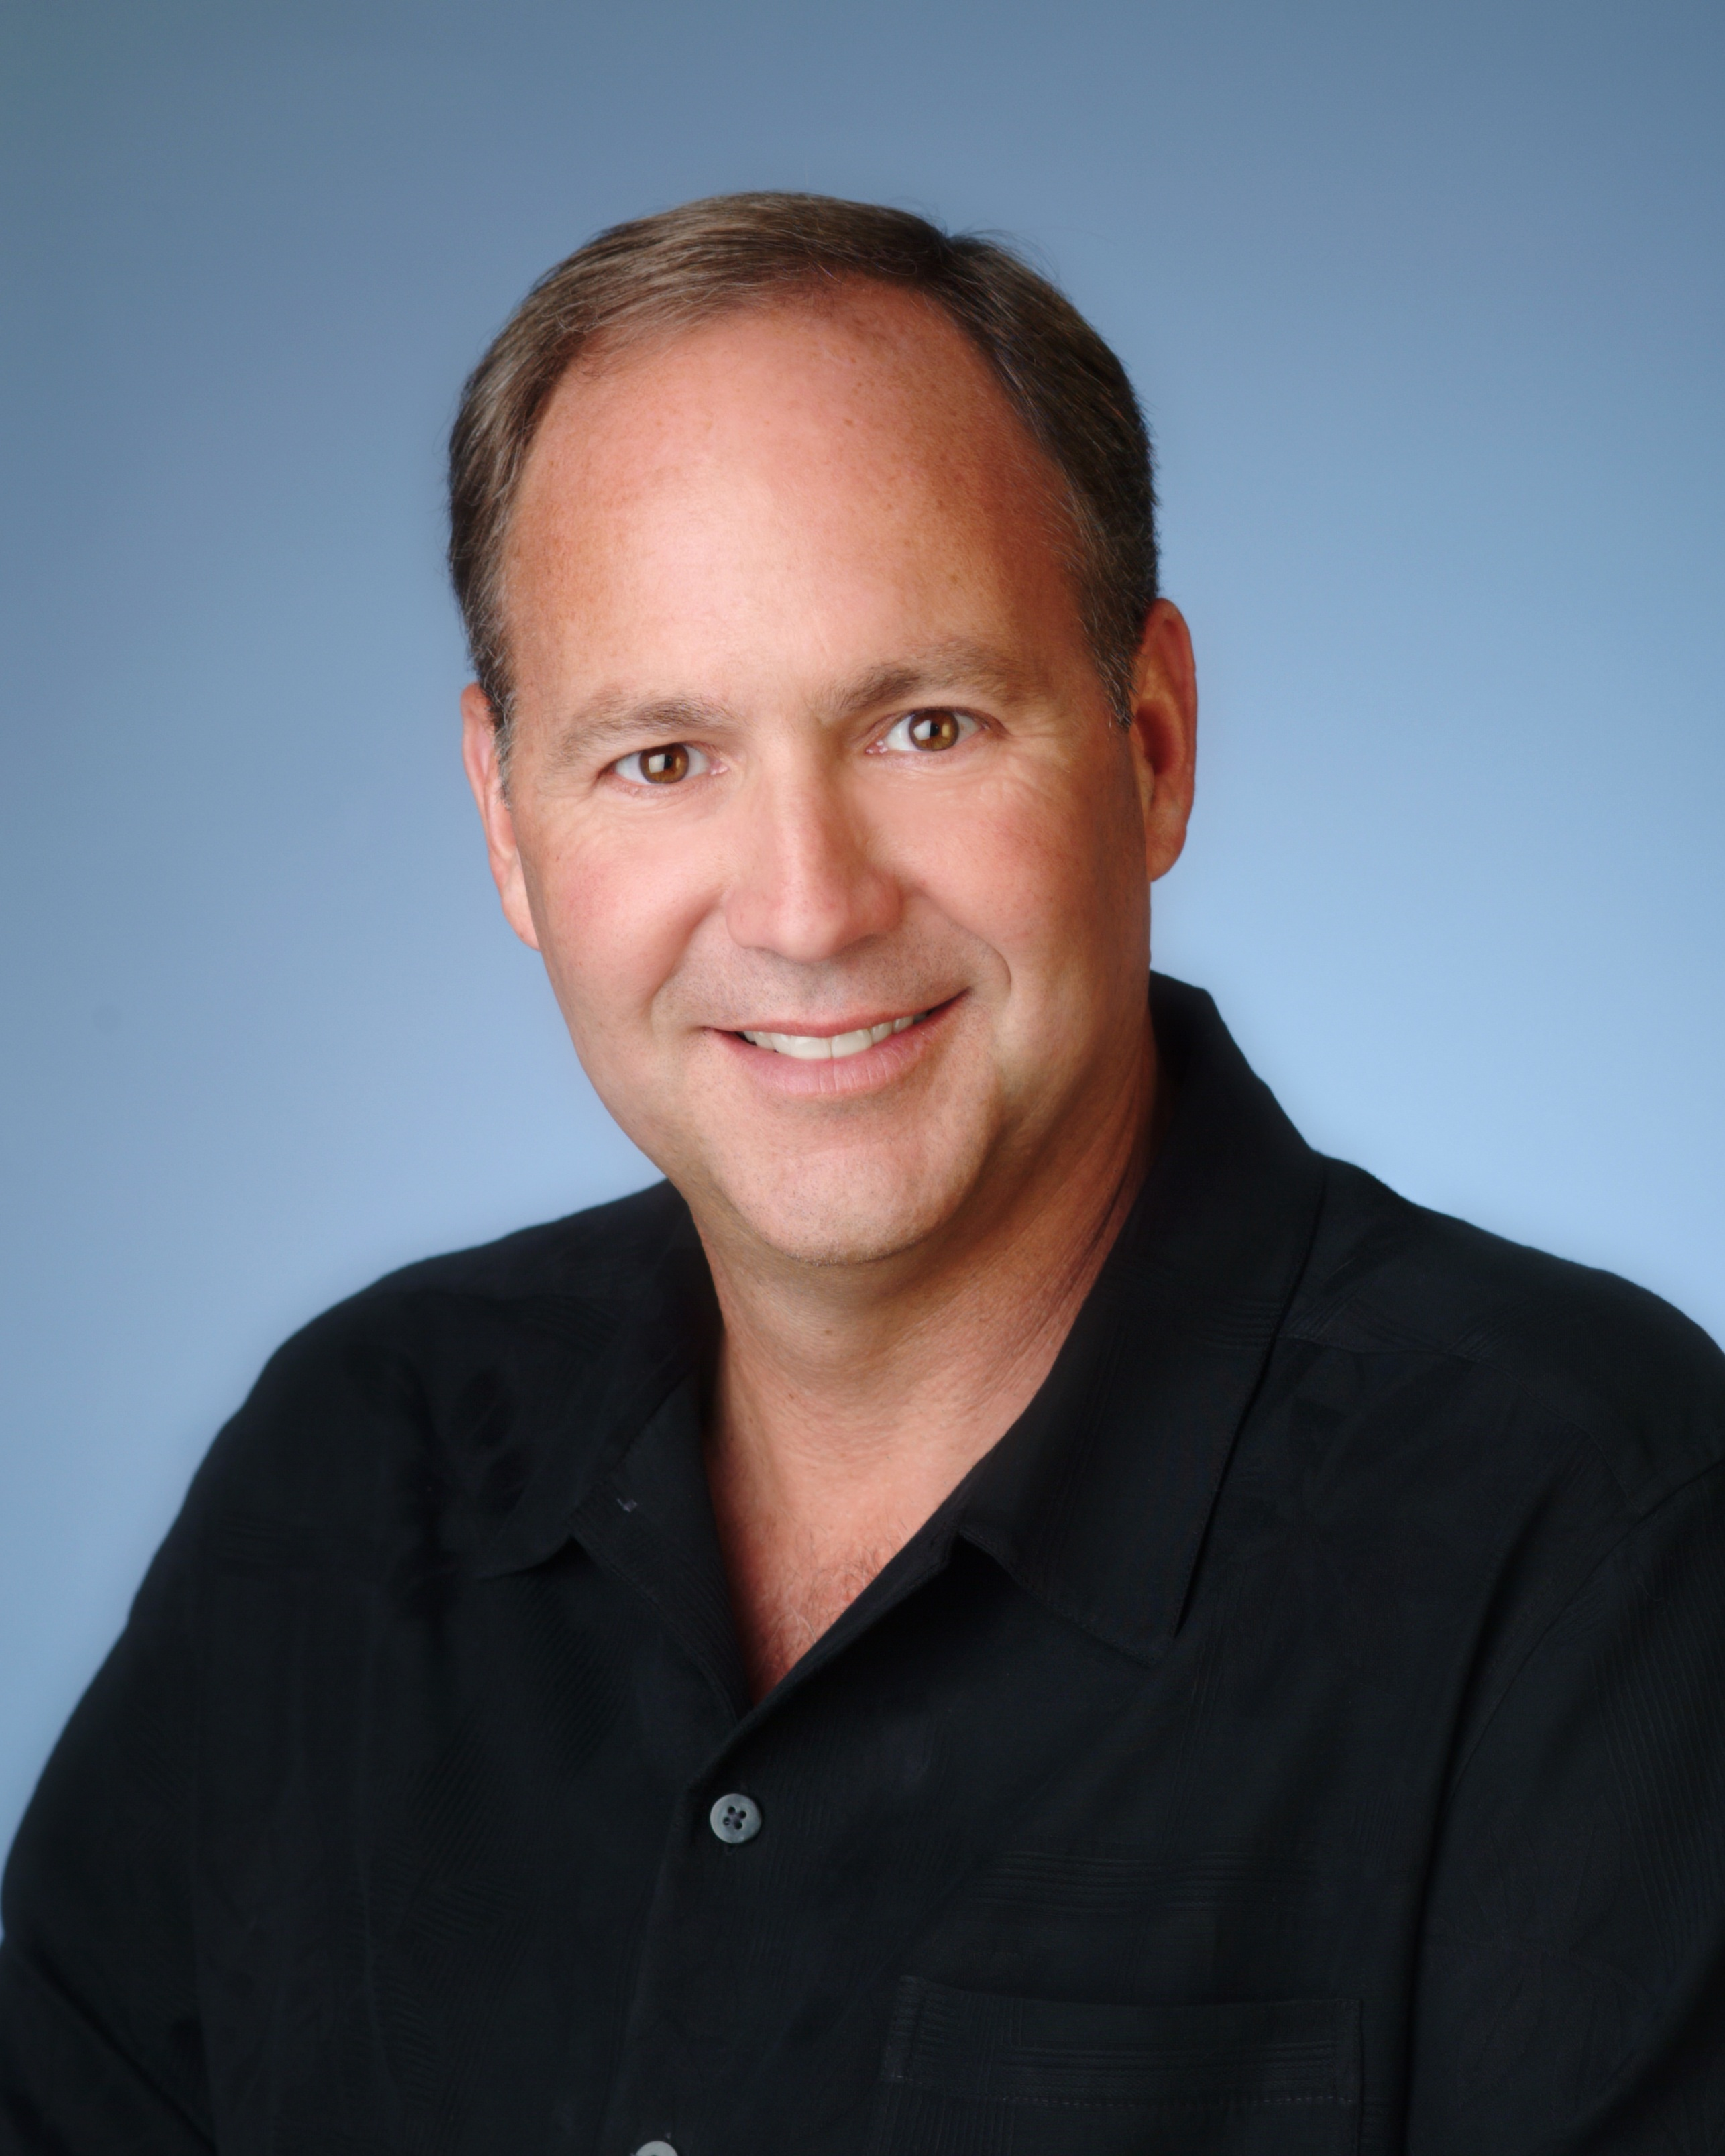 Darrell Steele